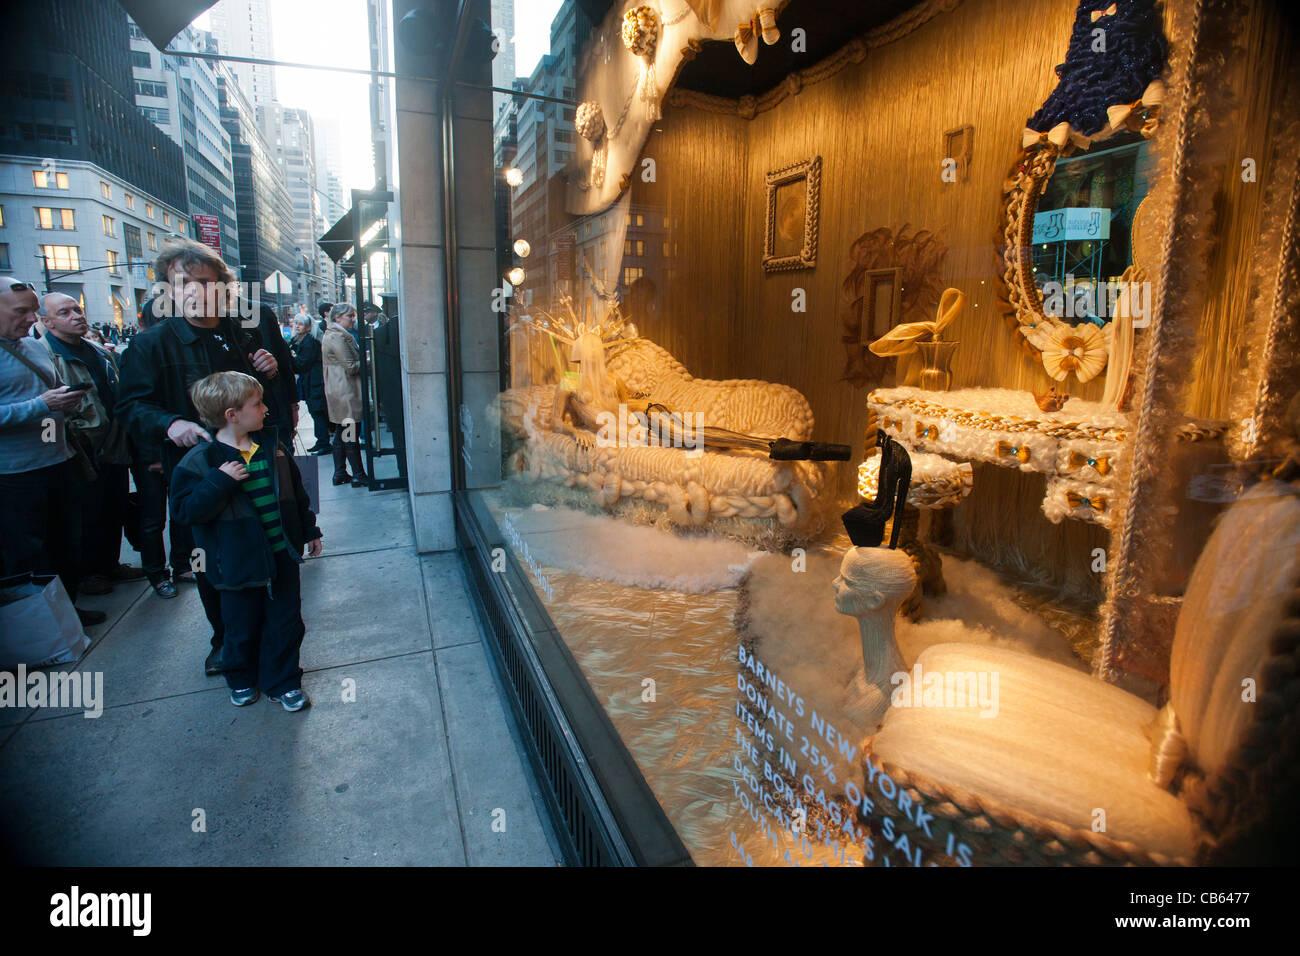 The Barney\'s Christmas window display, Gaga\'s Workshop featuring ...